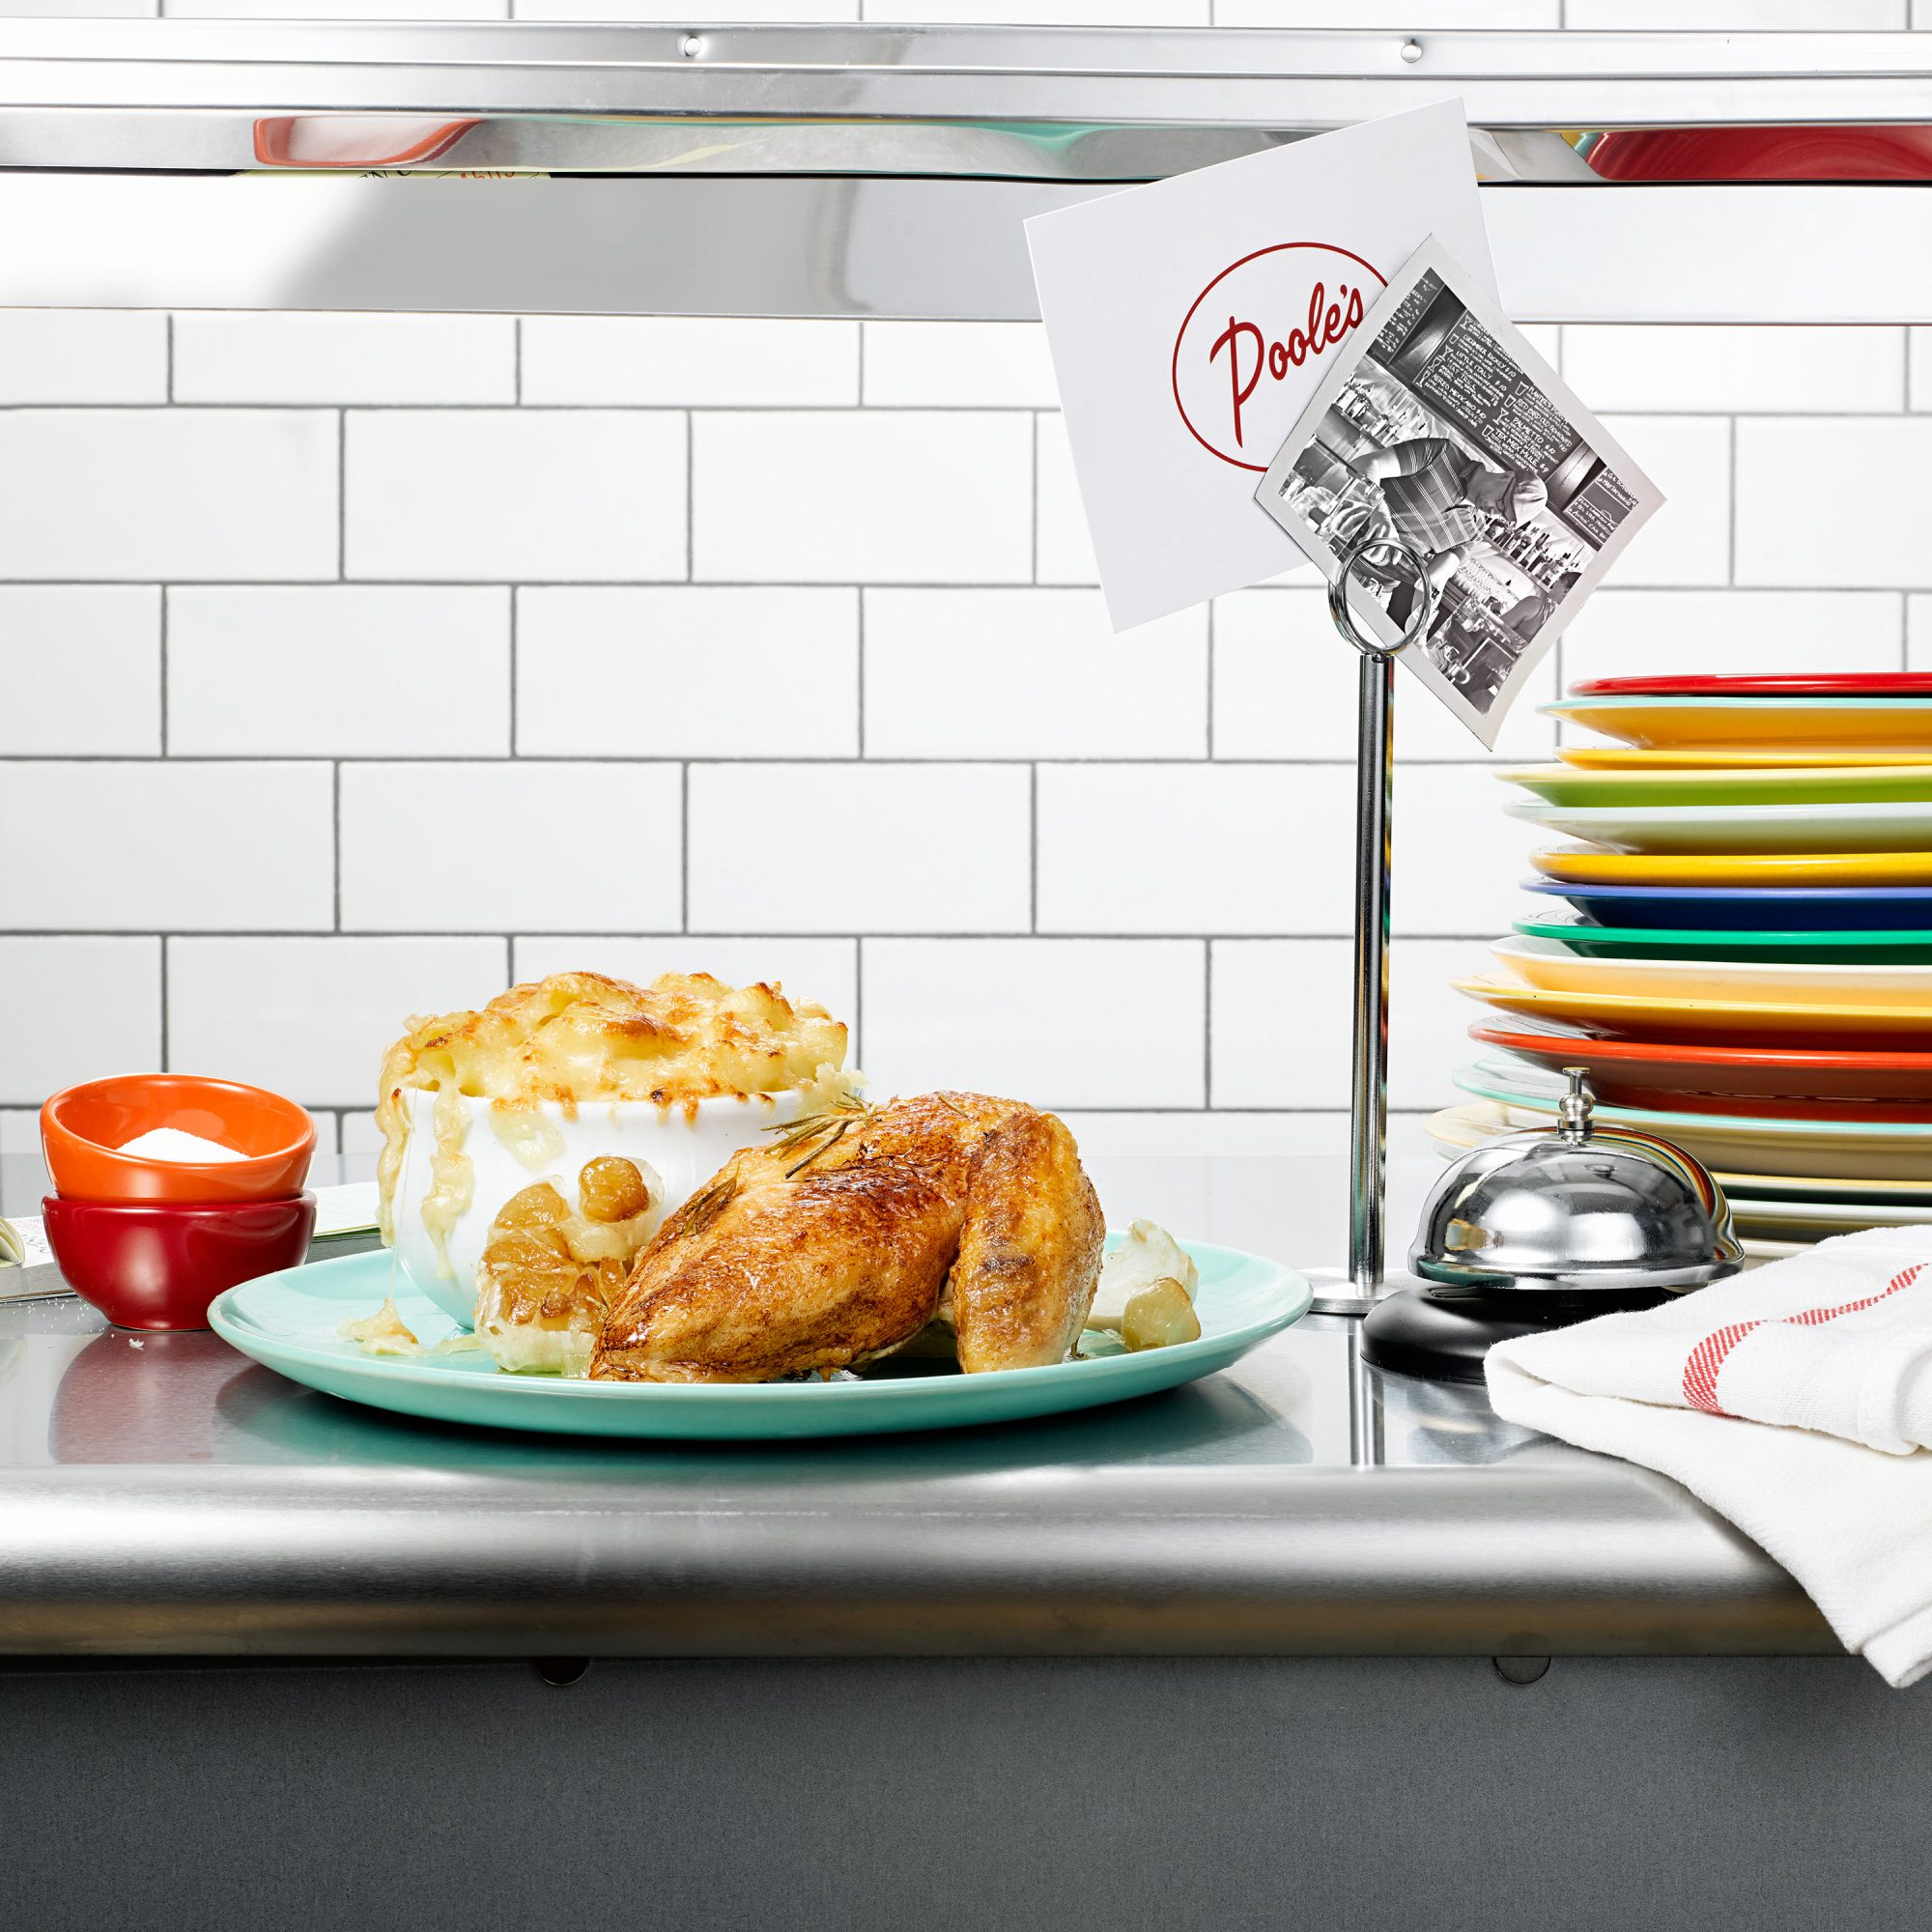 Cast-Iron Roast Chicken with Garlic and Herbs